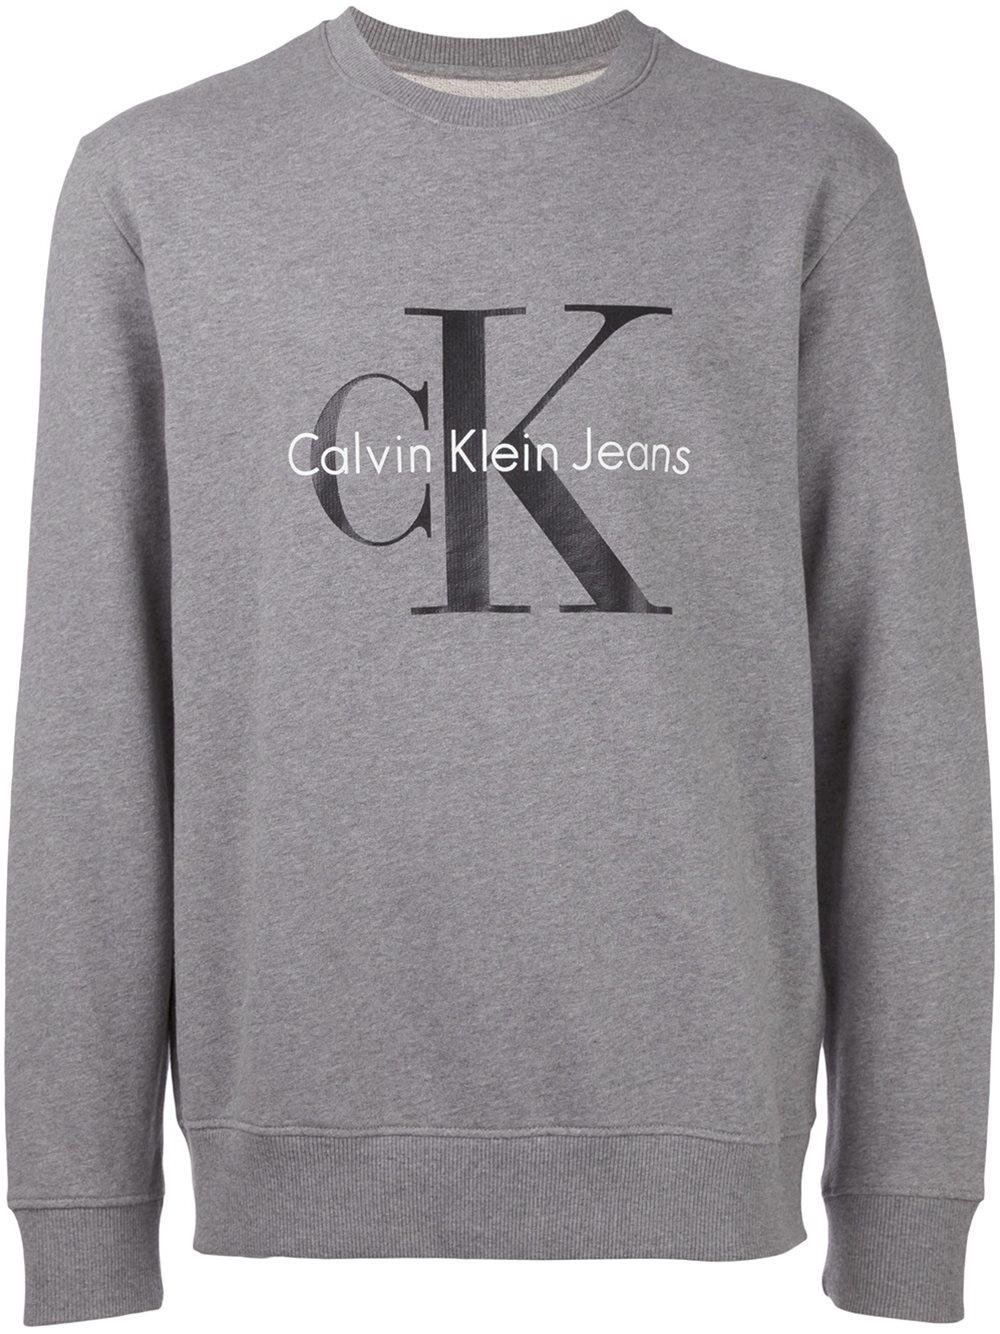 calvin klein jeans logo print crew neck sweatshirt in multicolor for men grey lyst. Black Bedroom Furniture Sets. Home Design Ideas